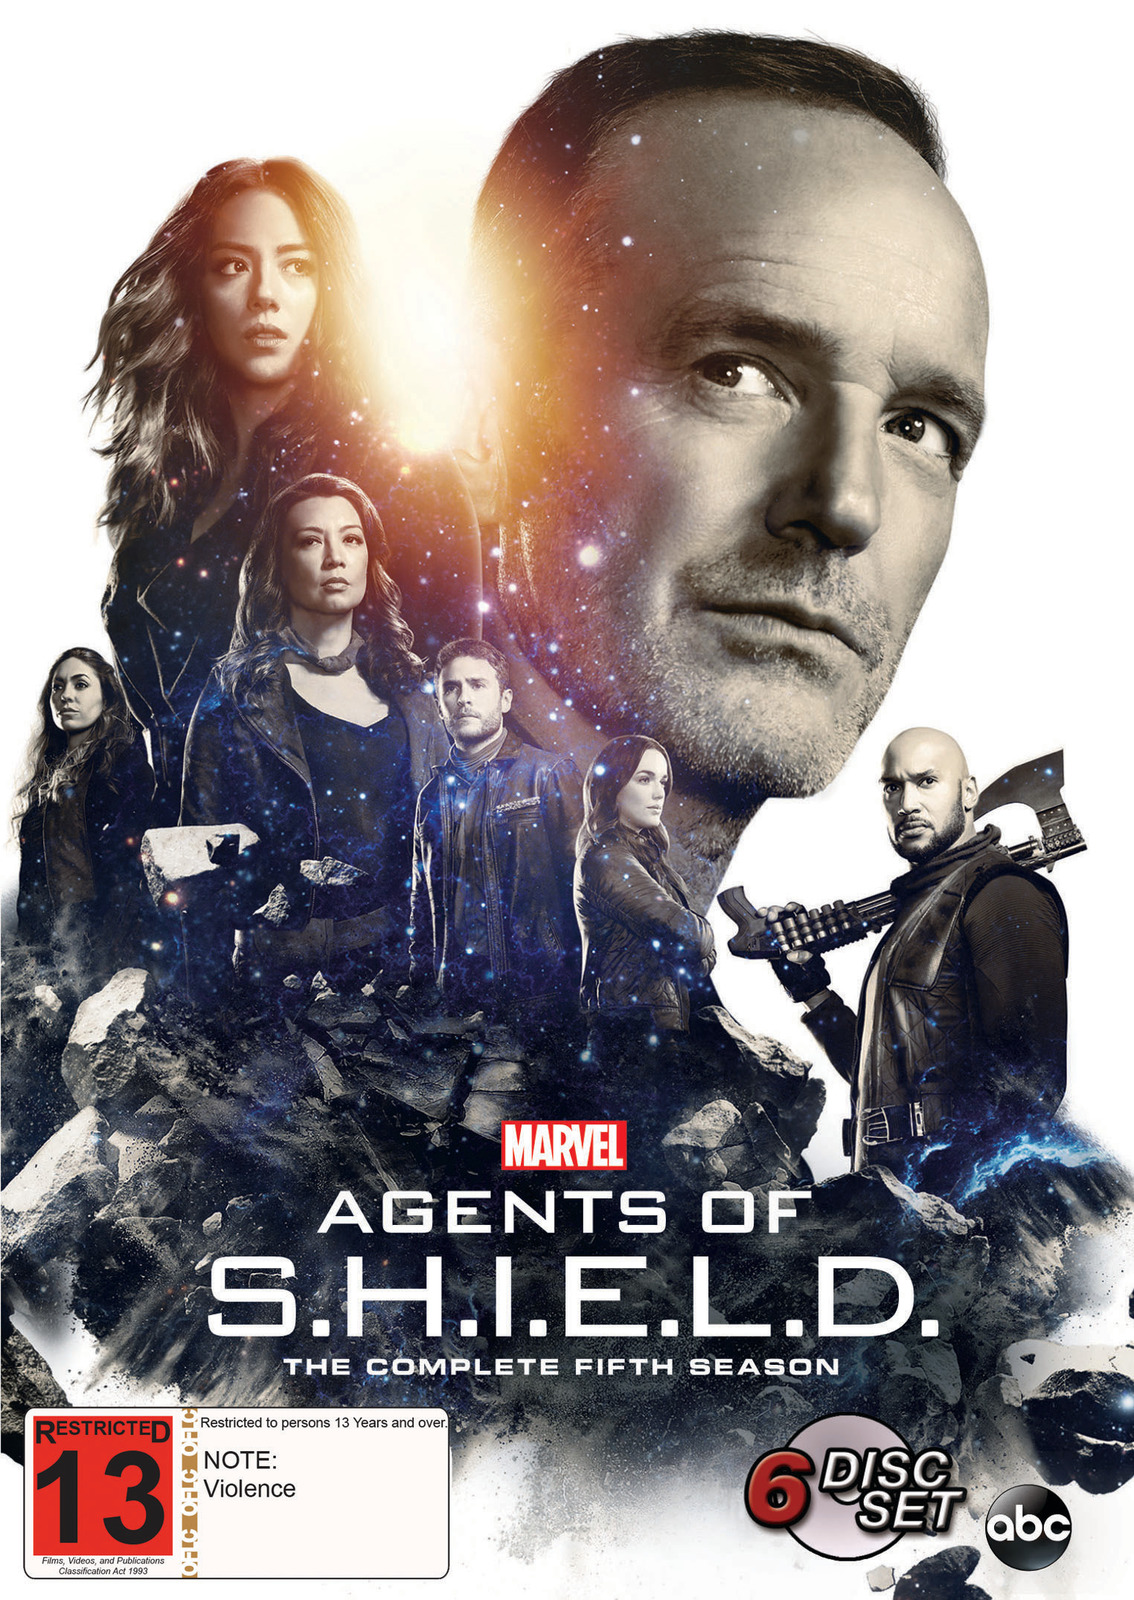 Agents Of S.H.I.E.L.D. - Season 5 on DVD image